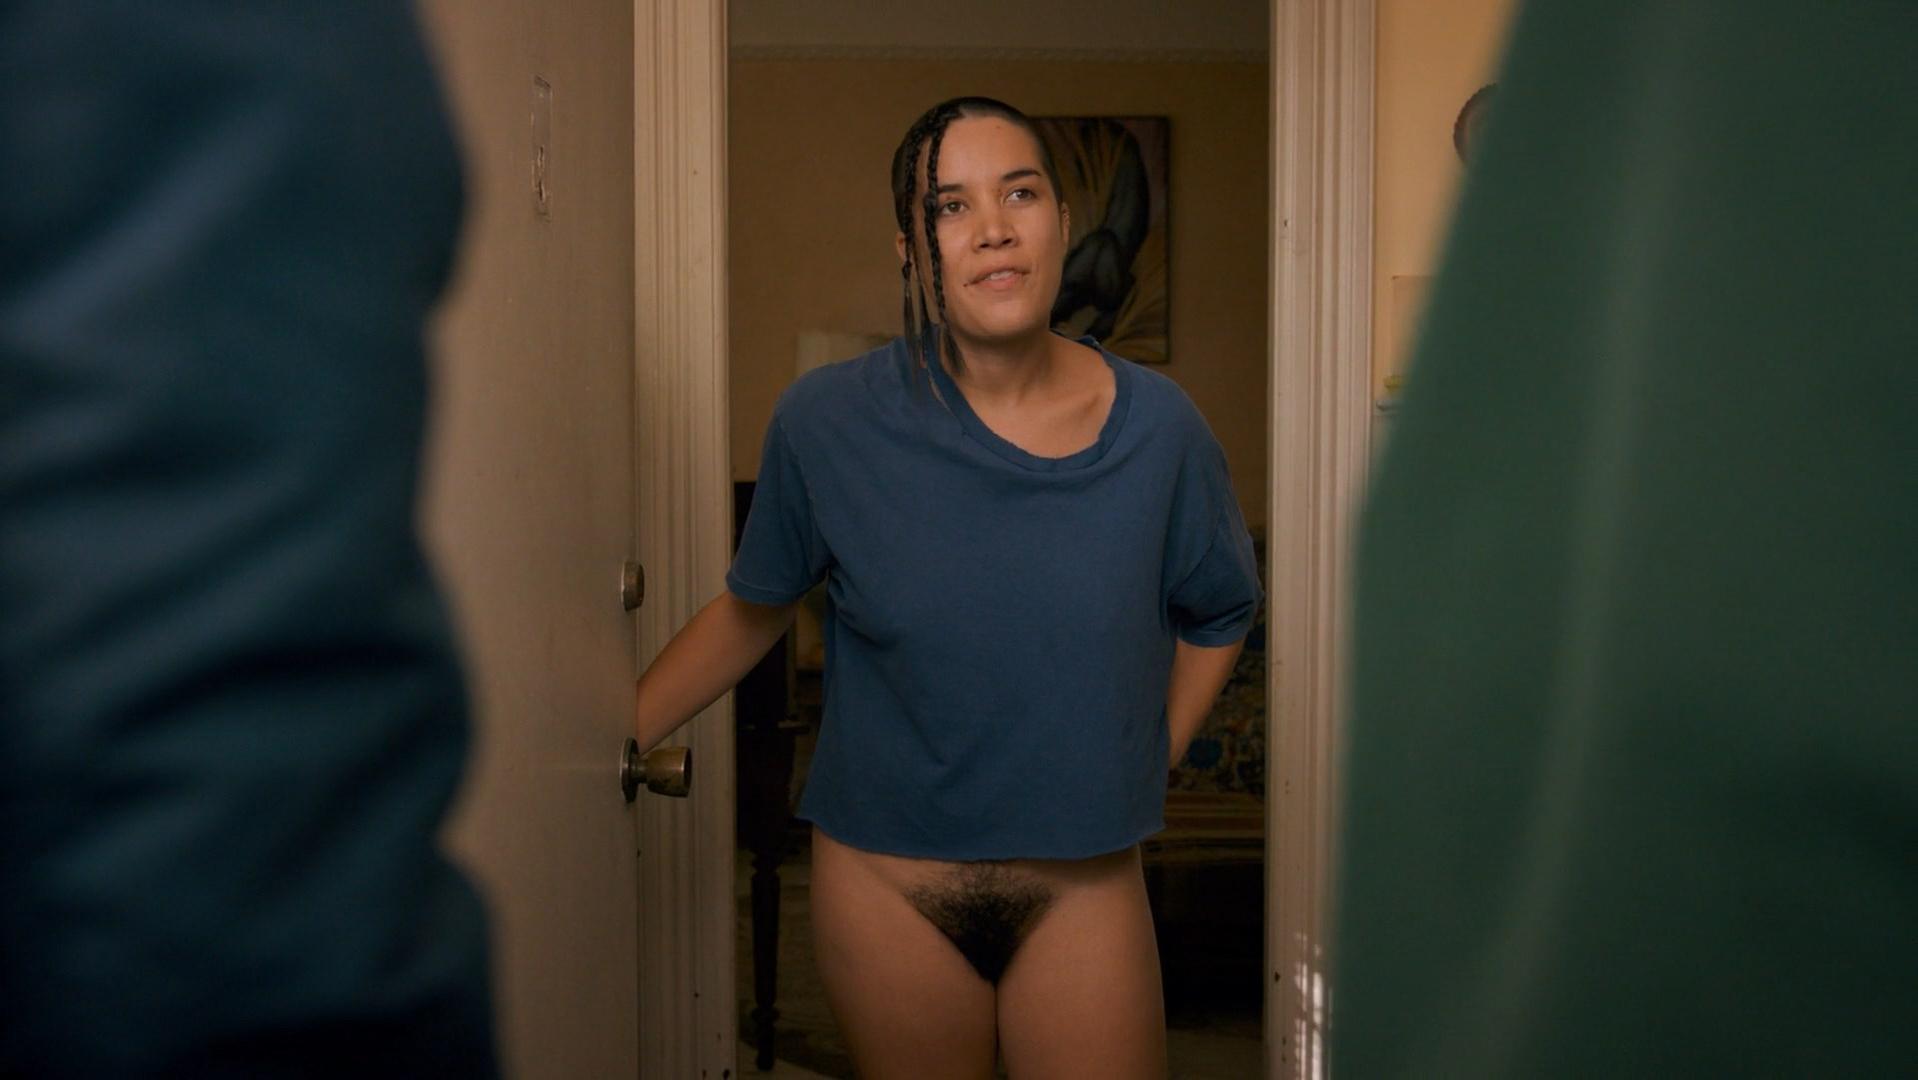 Celebs nude bushnu anime les @todorazor.com